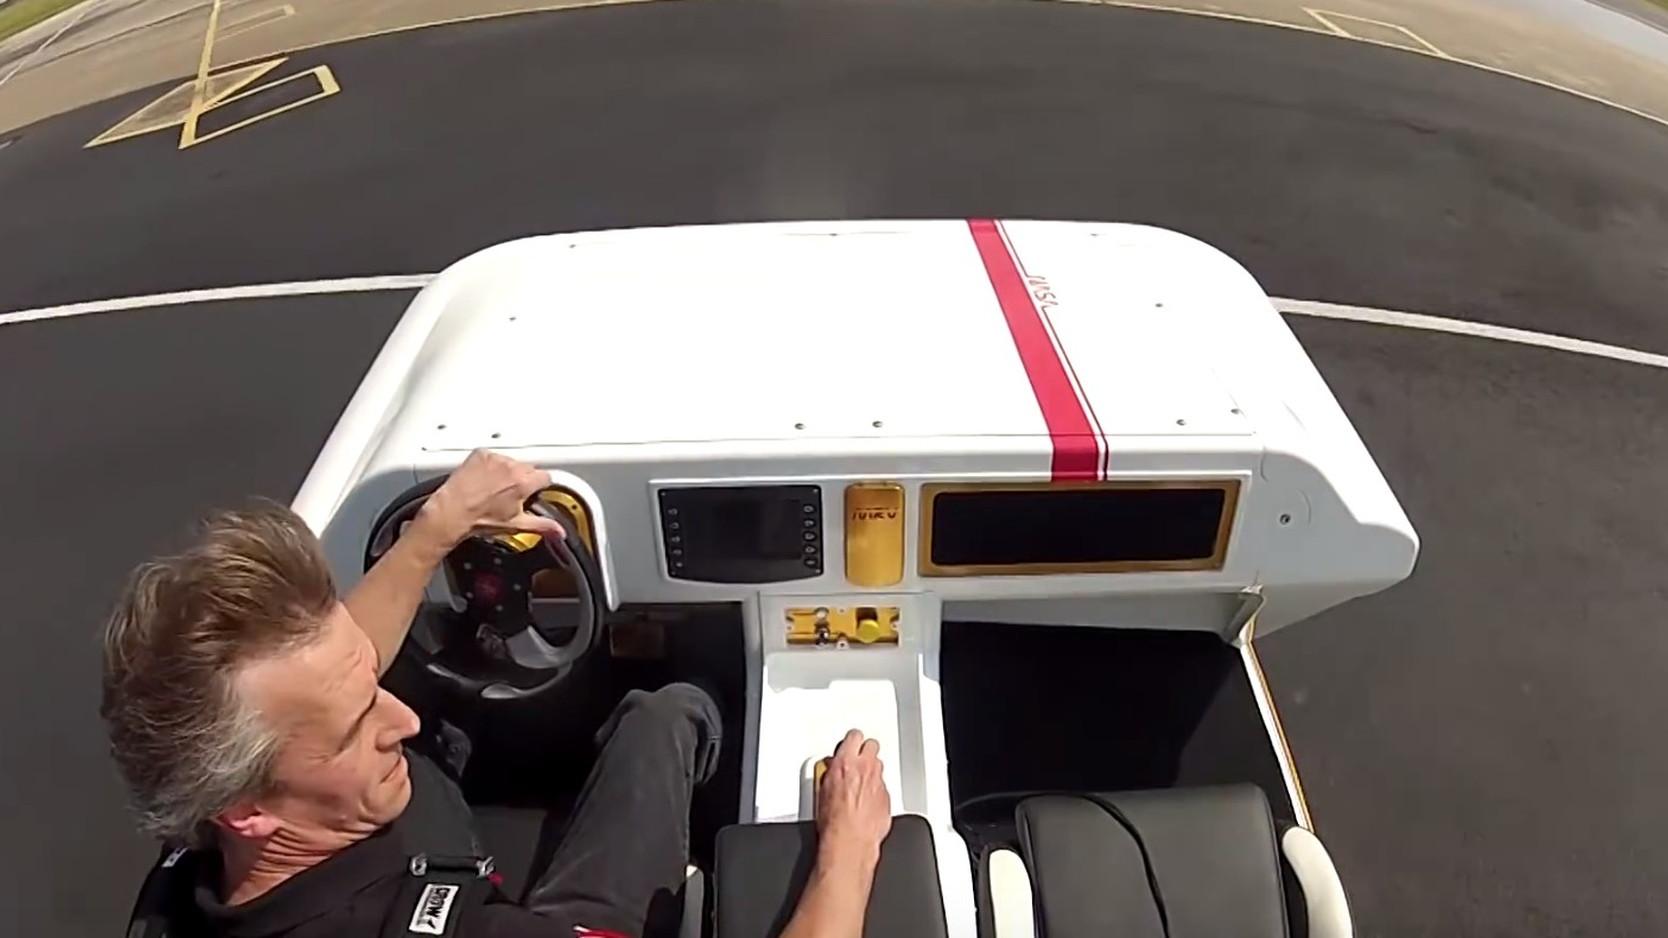 NASA's Modular Robotic Vehicle (MRV) prototype